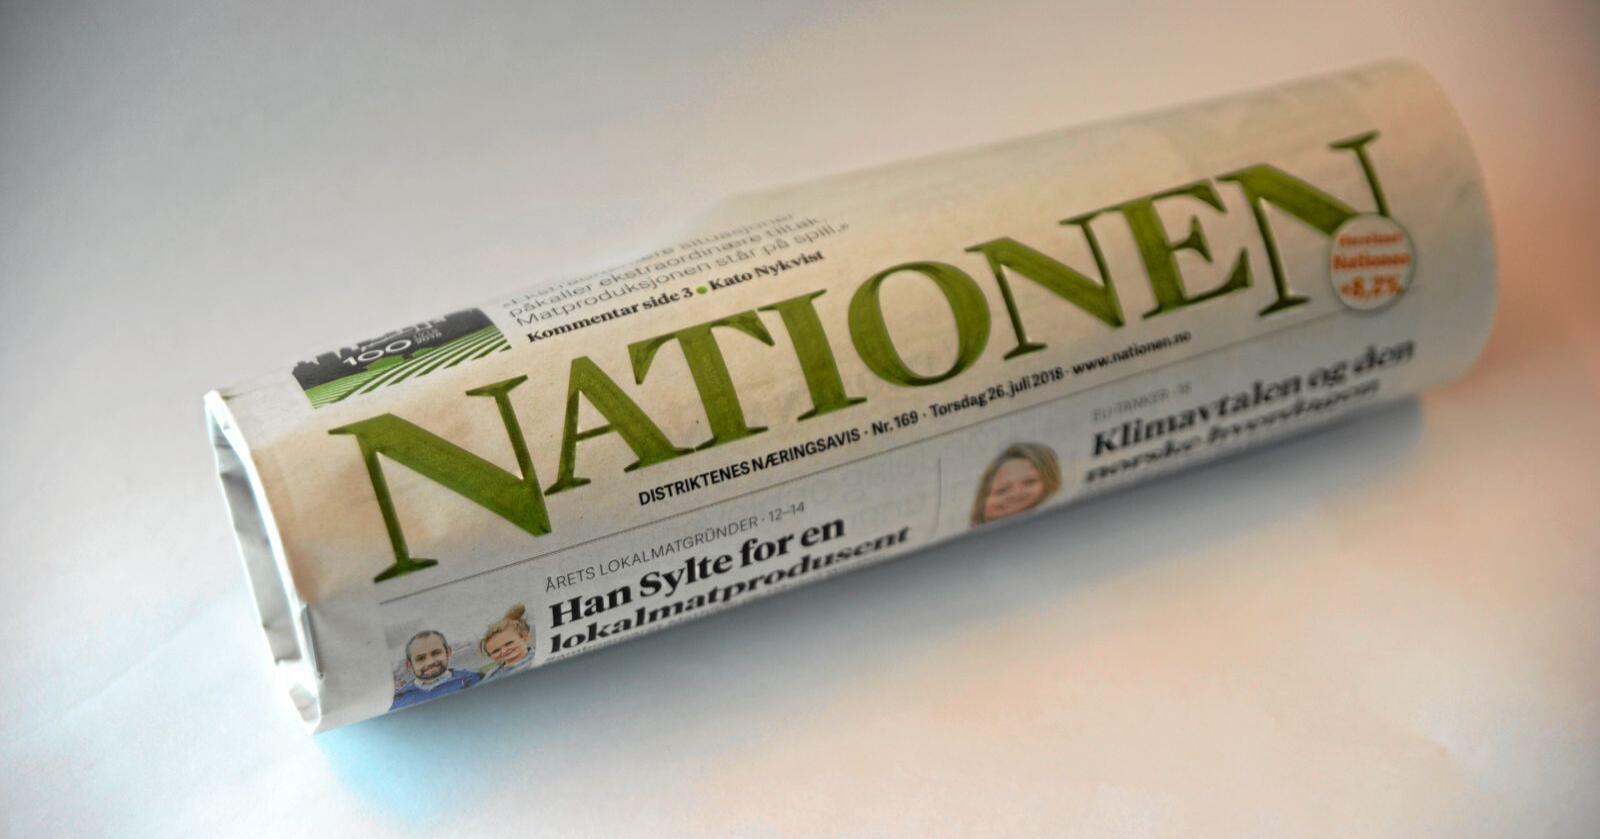 Knapt noko anna politisk parti har blitt tilgodesett med ei heil avisutgåve på ein av dei runde åremålsdagane sine, skriv Jon Ingebrigtsen om Nationens dekning av Senterpartiets jubileum. Foto: Mariann Tvete